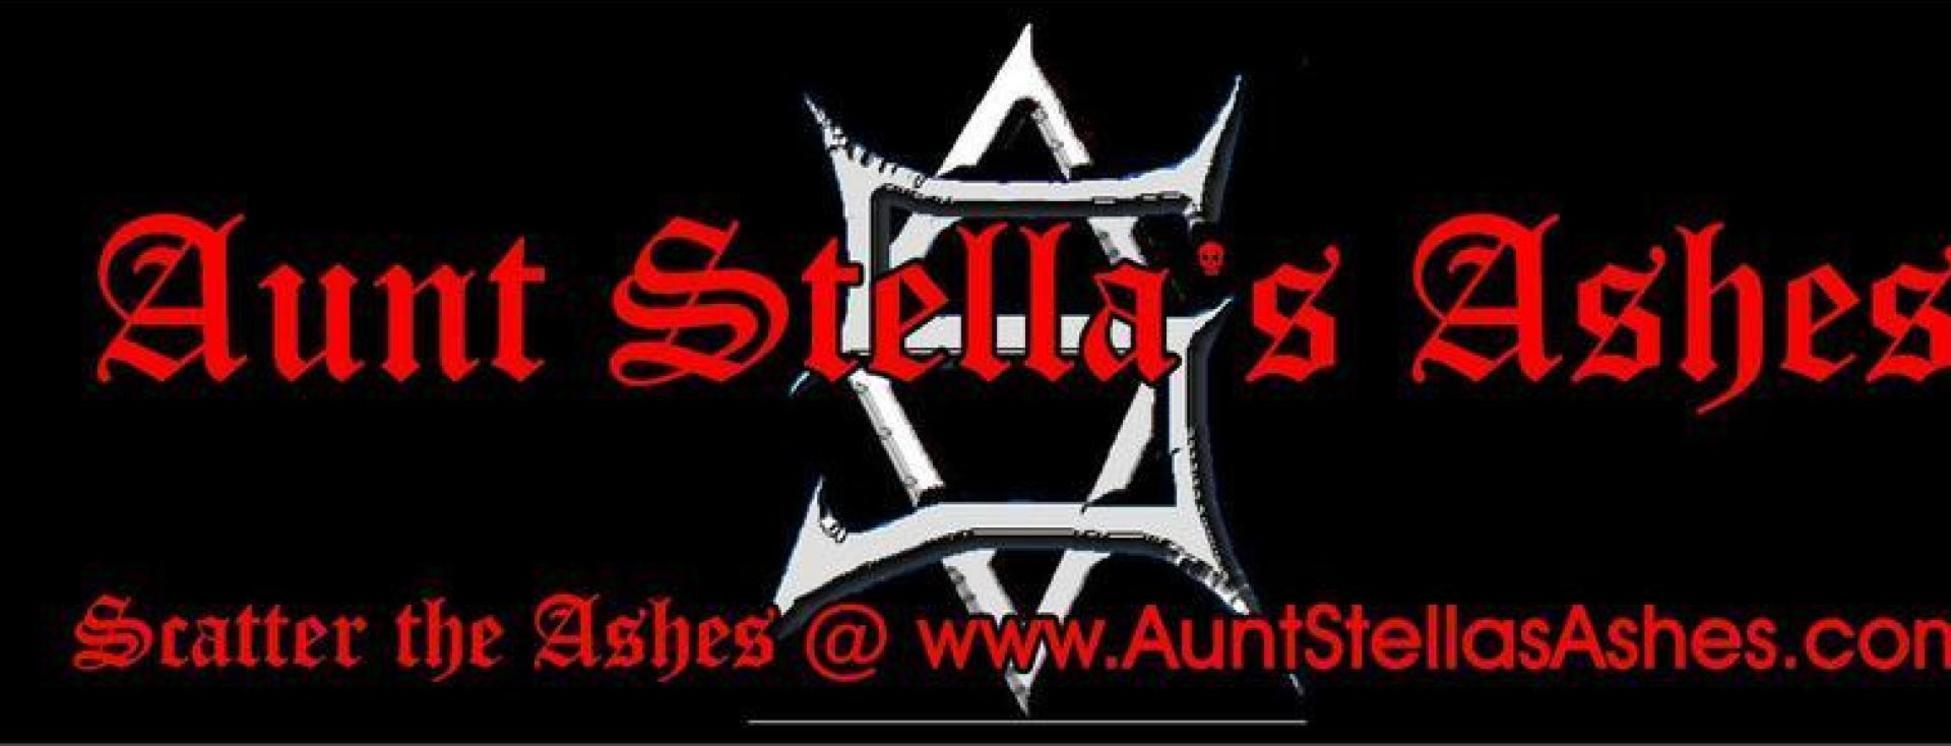 1312515470 aunt stellas ashes banner copy